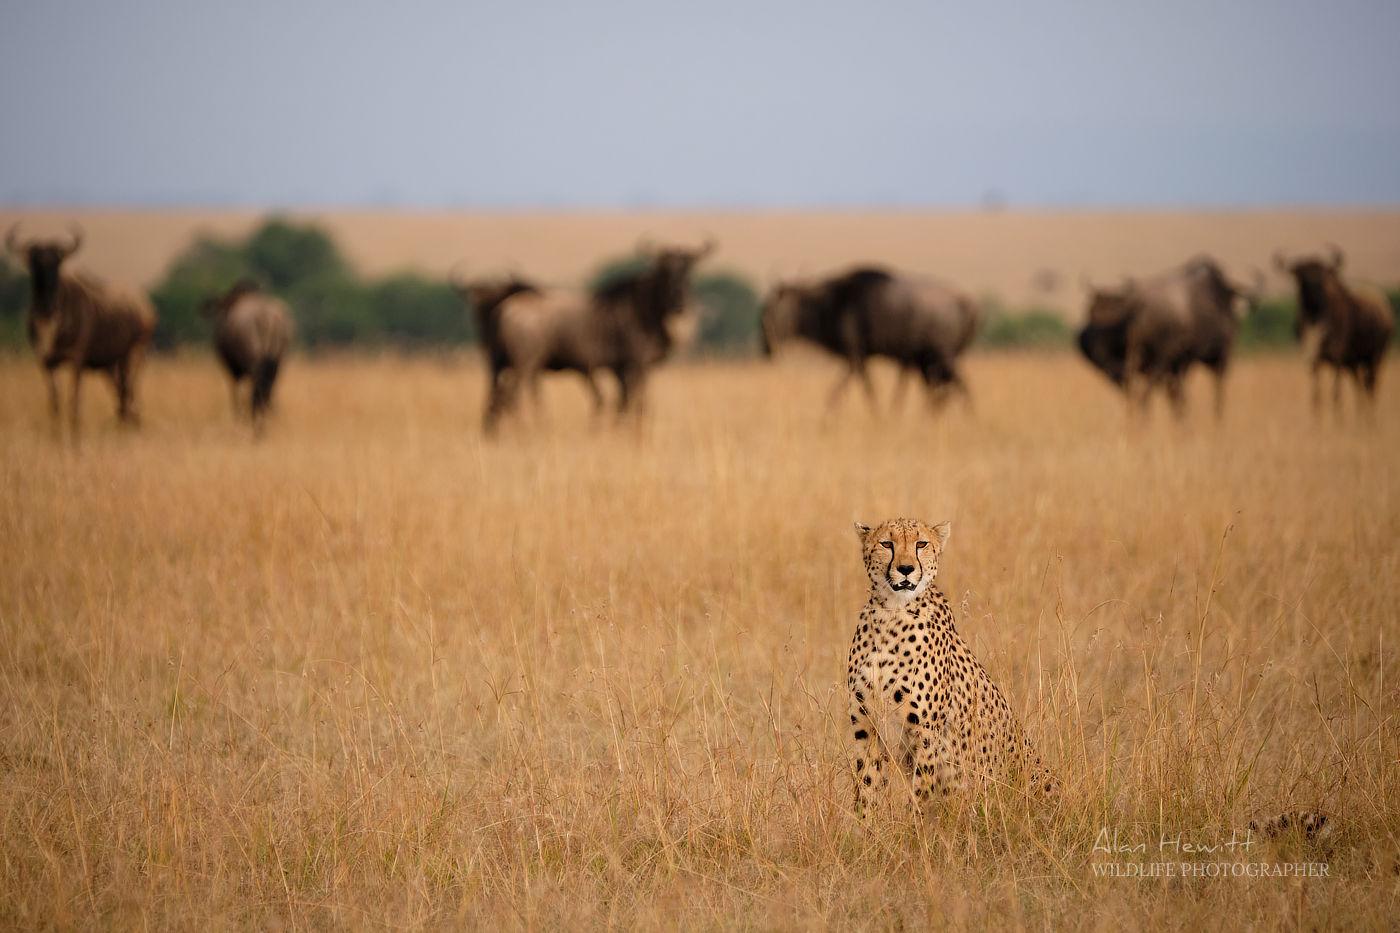 Cheetah Maasai Mara African Photography Safari Alan Hewitt